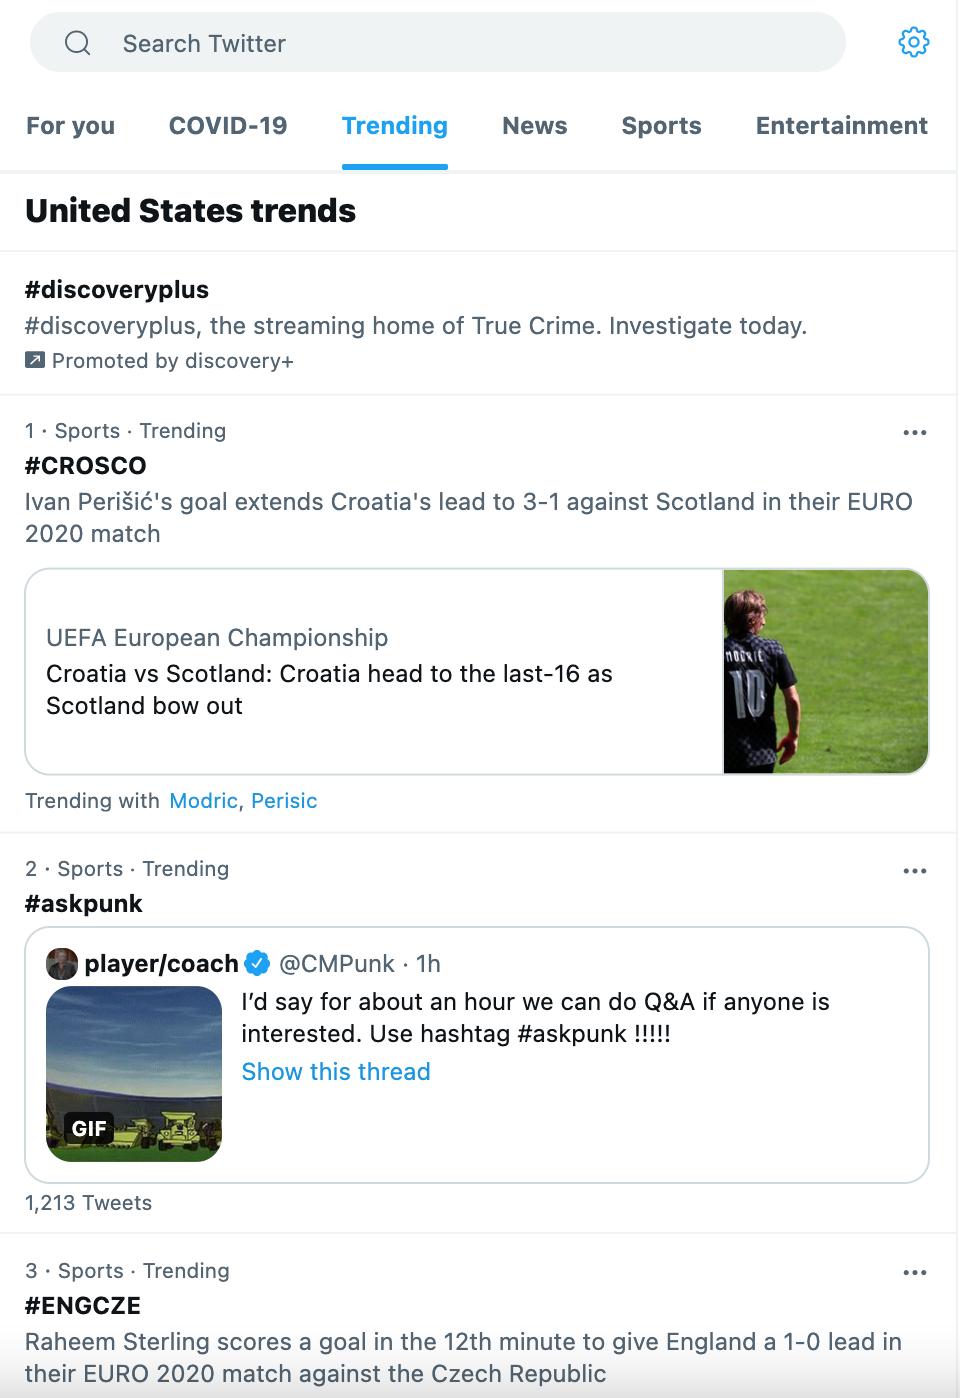 Twitter's trending topics page